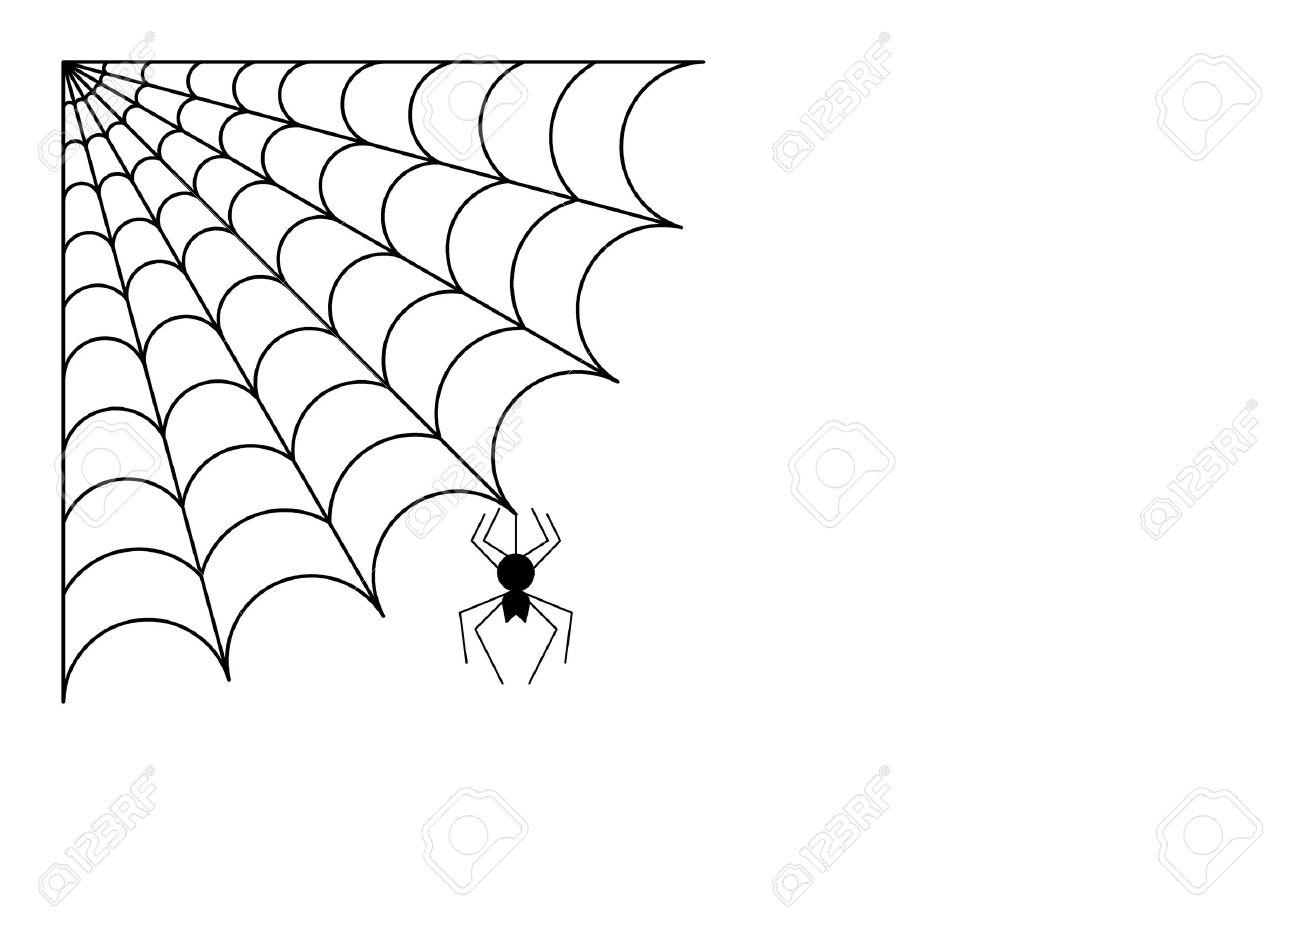 Araignée Avec Toile D'araignée tout Dessin Toile Araignée